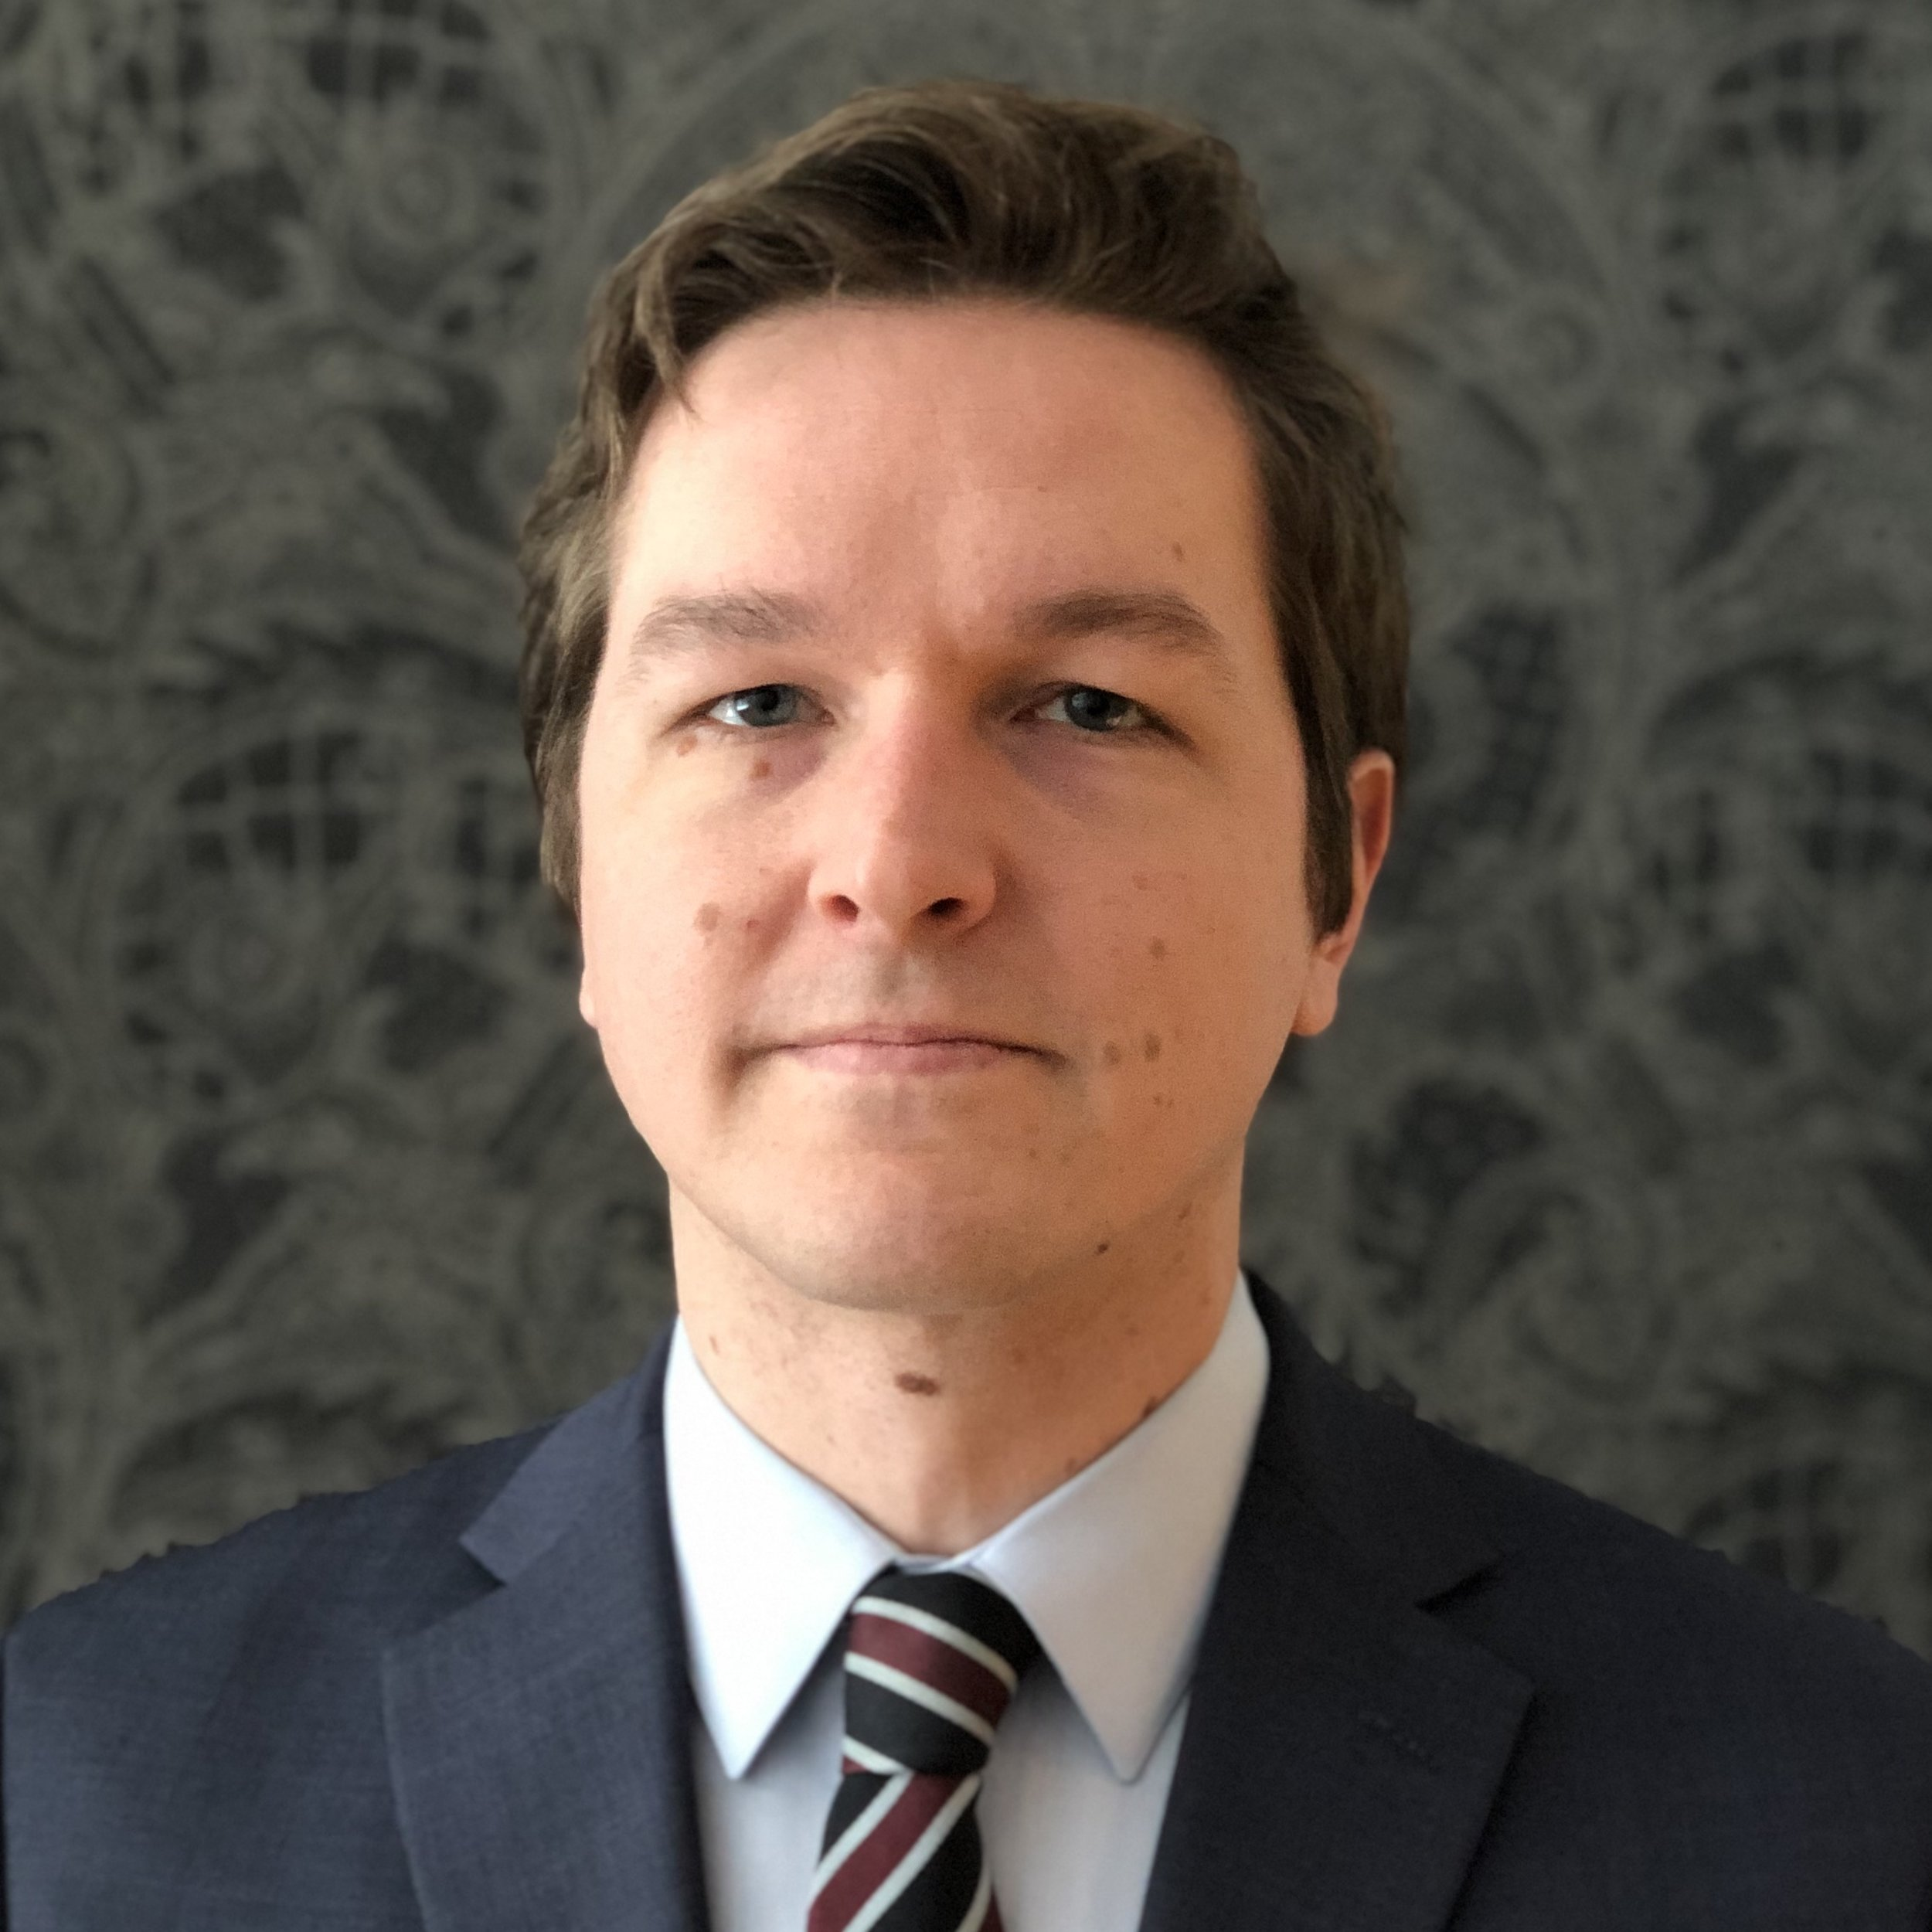 Scott Wilson, B.A., J.D. - scottwilsondefence.com